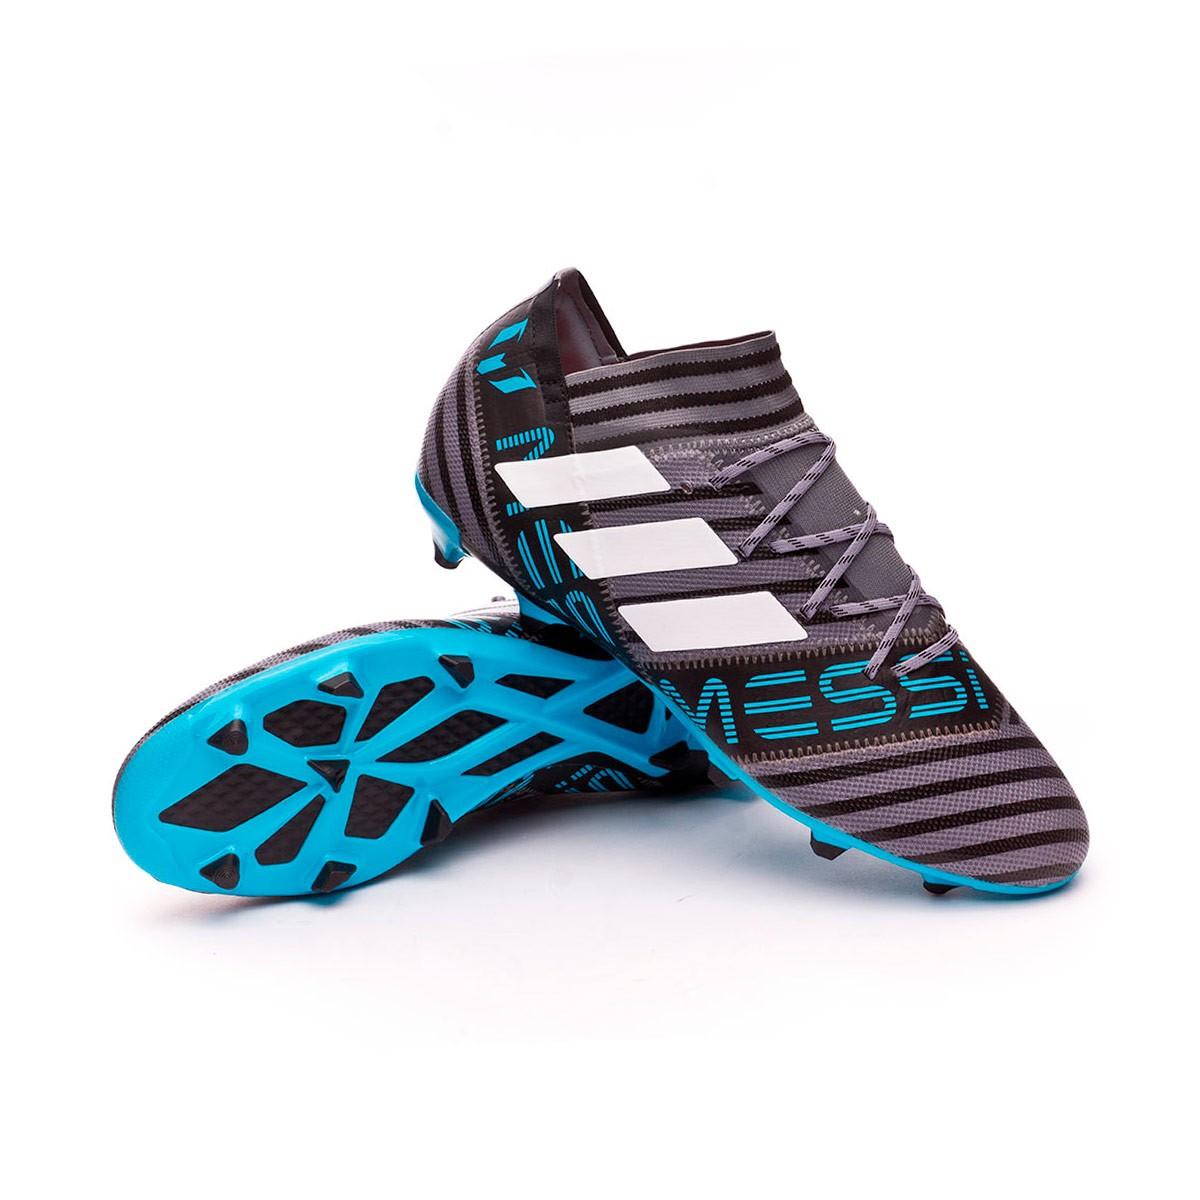 ad67f0d49 Football Boots adidas Nemeziz Messi 17.2 FG Grey-White-Core black ...